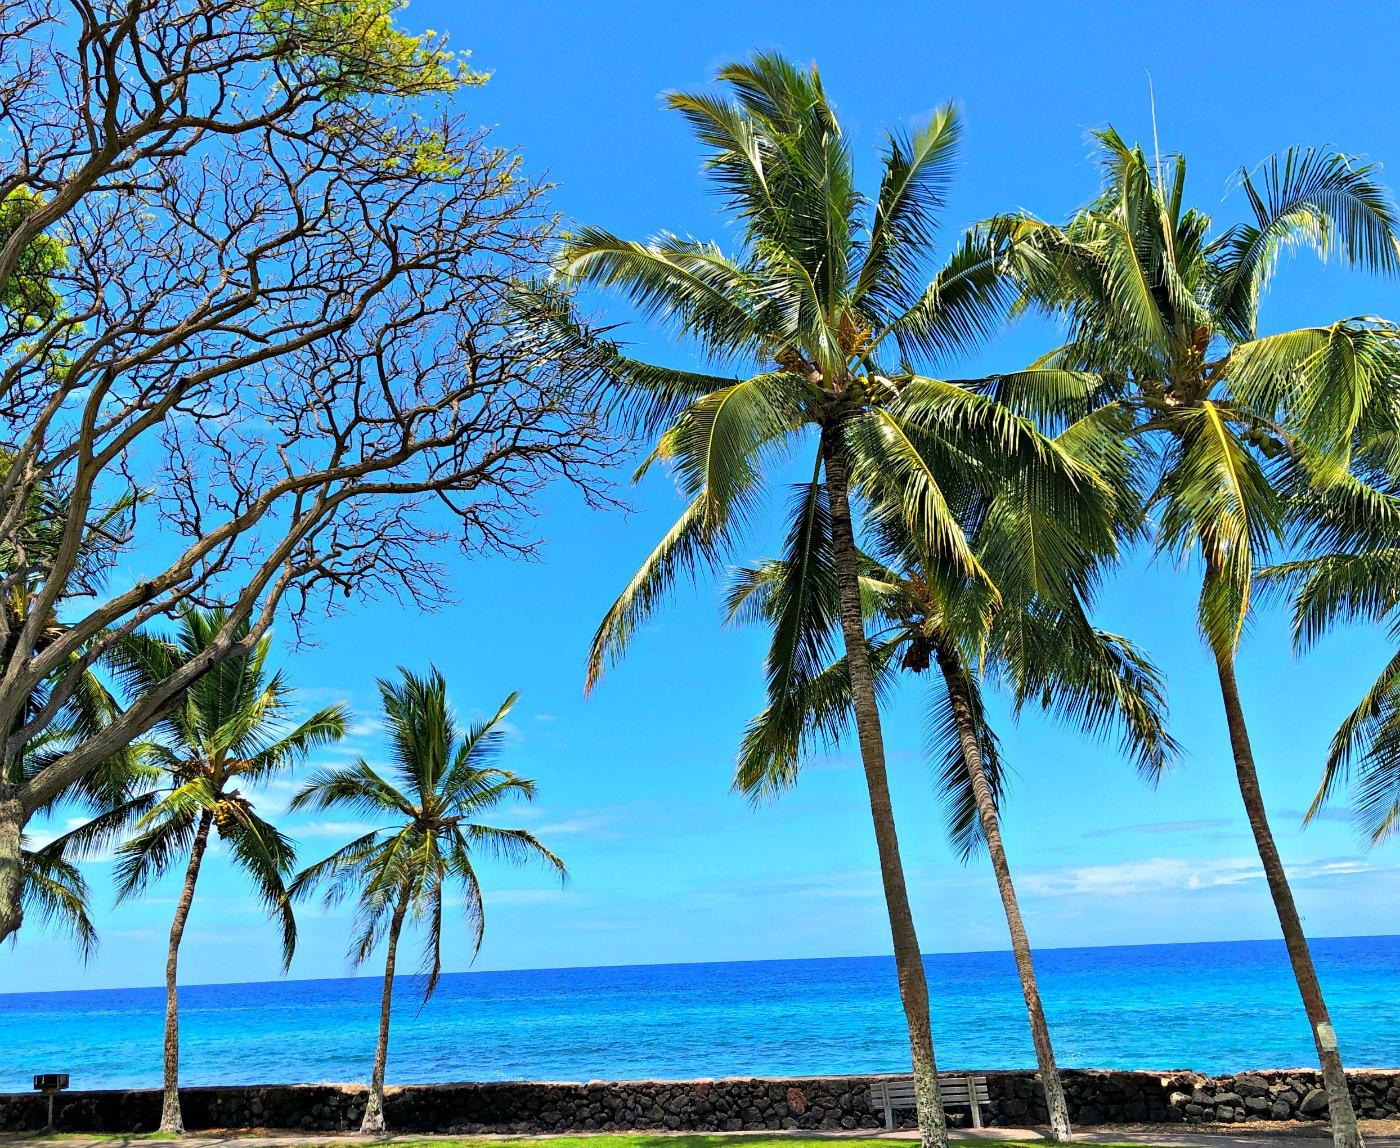 KIANA TOM VIEW KONA HAWAII